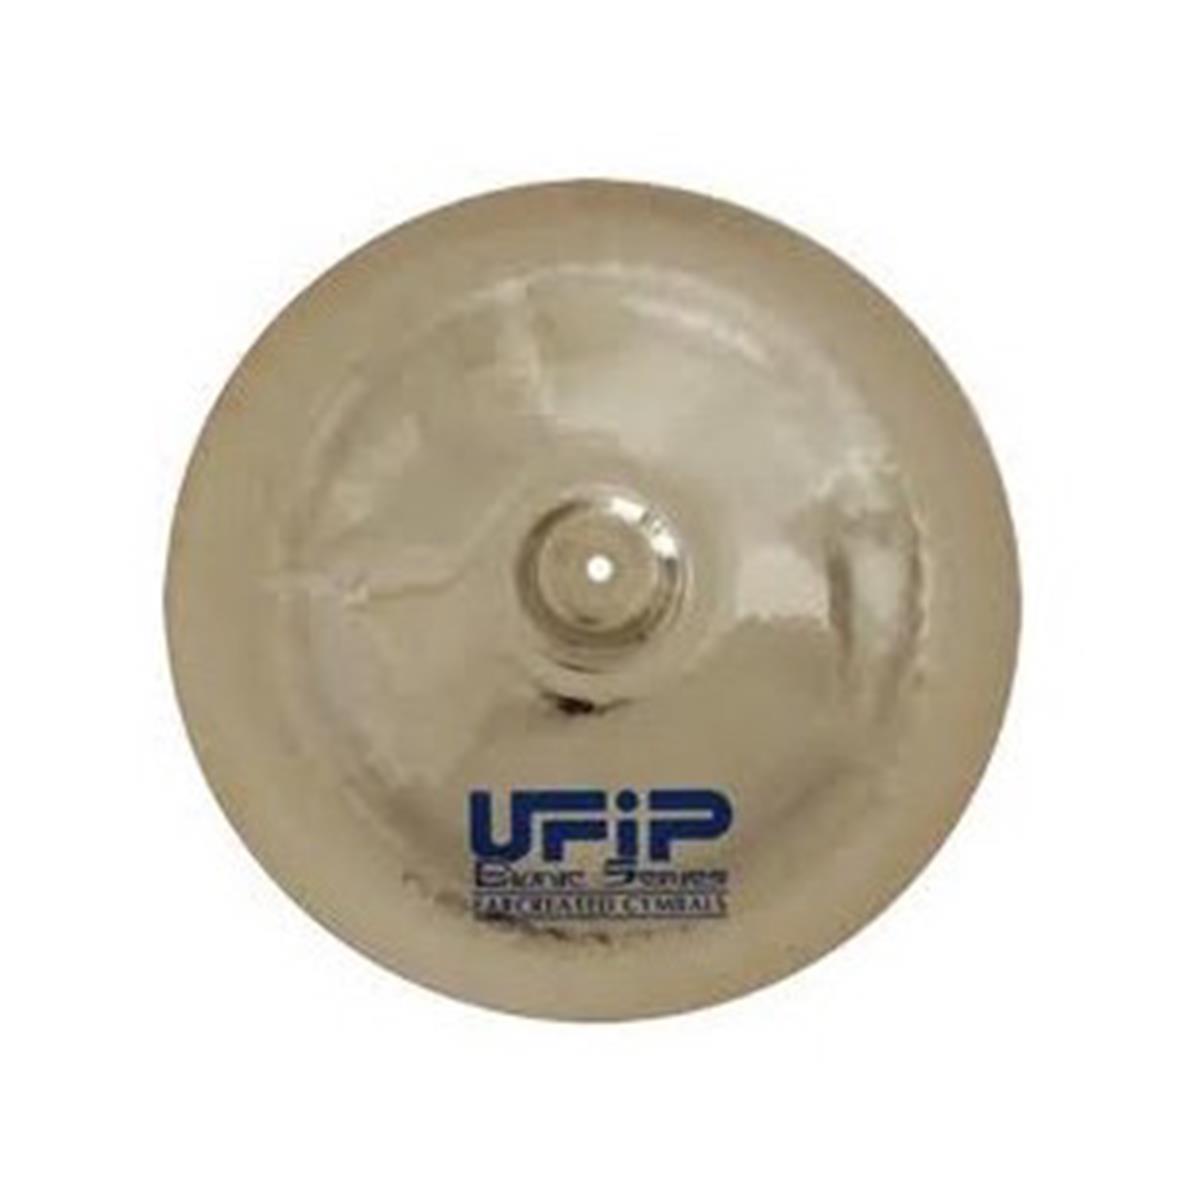 UFIP BIONIC CHINA 18